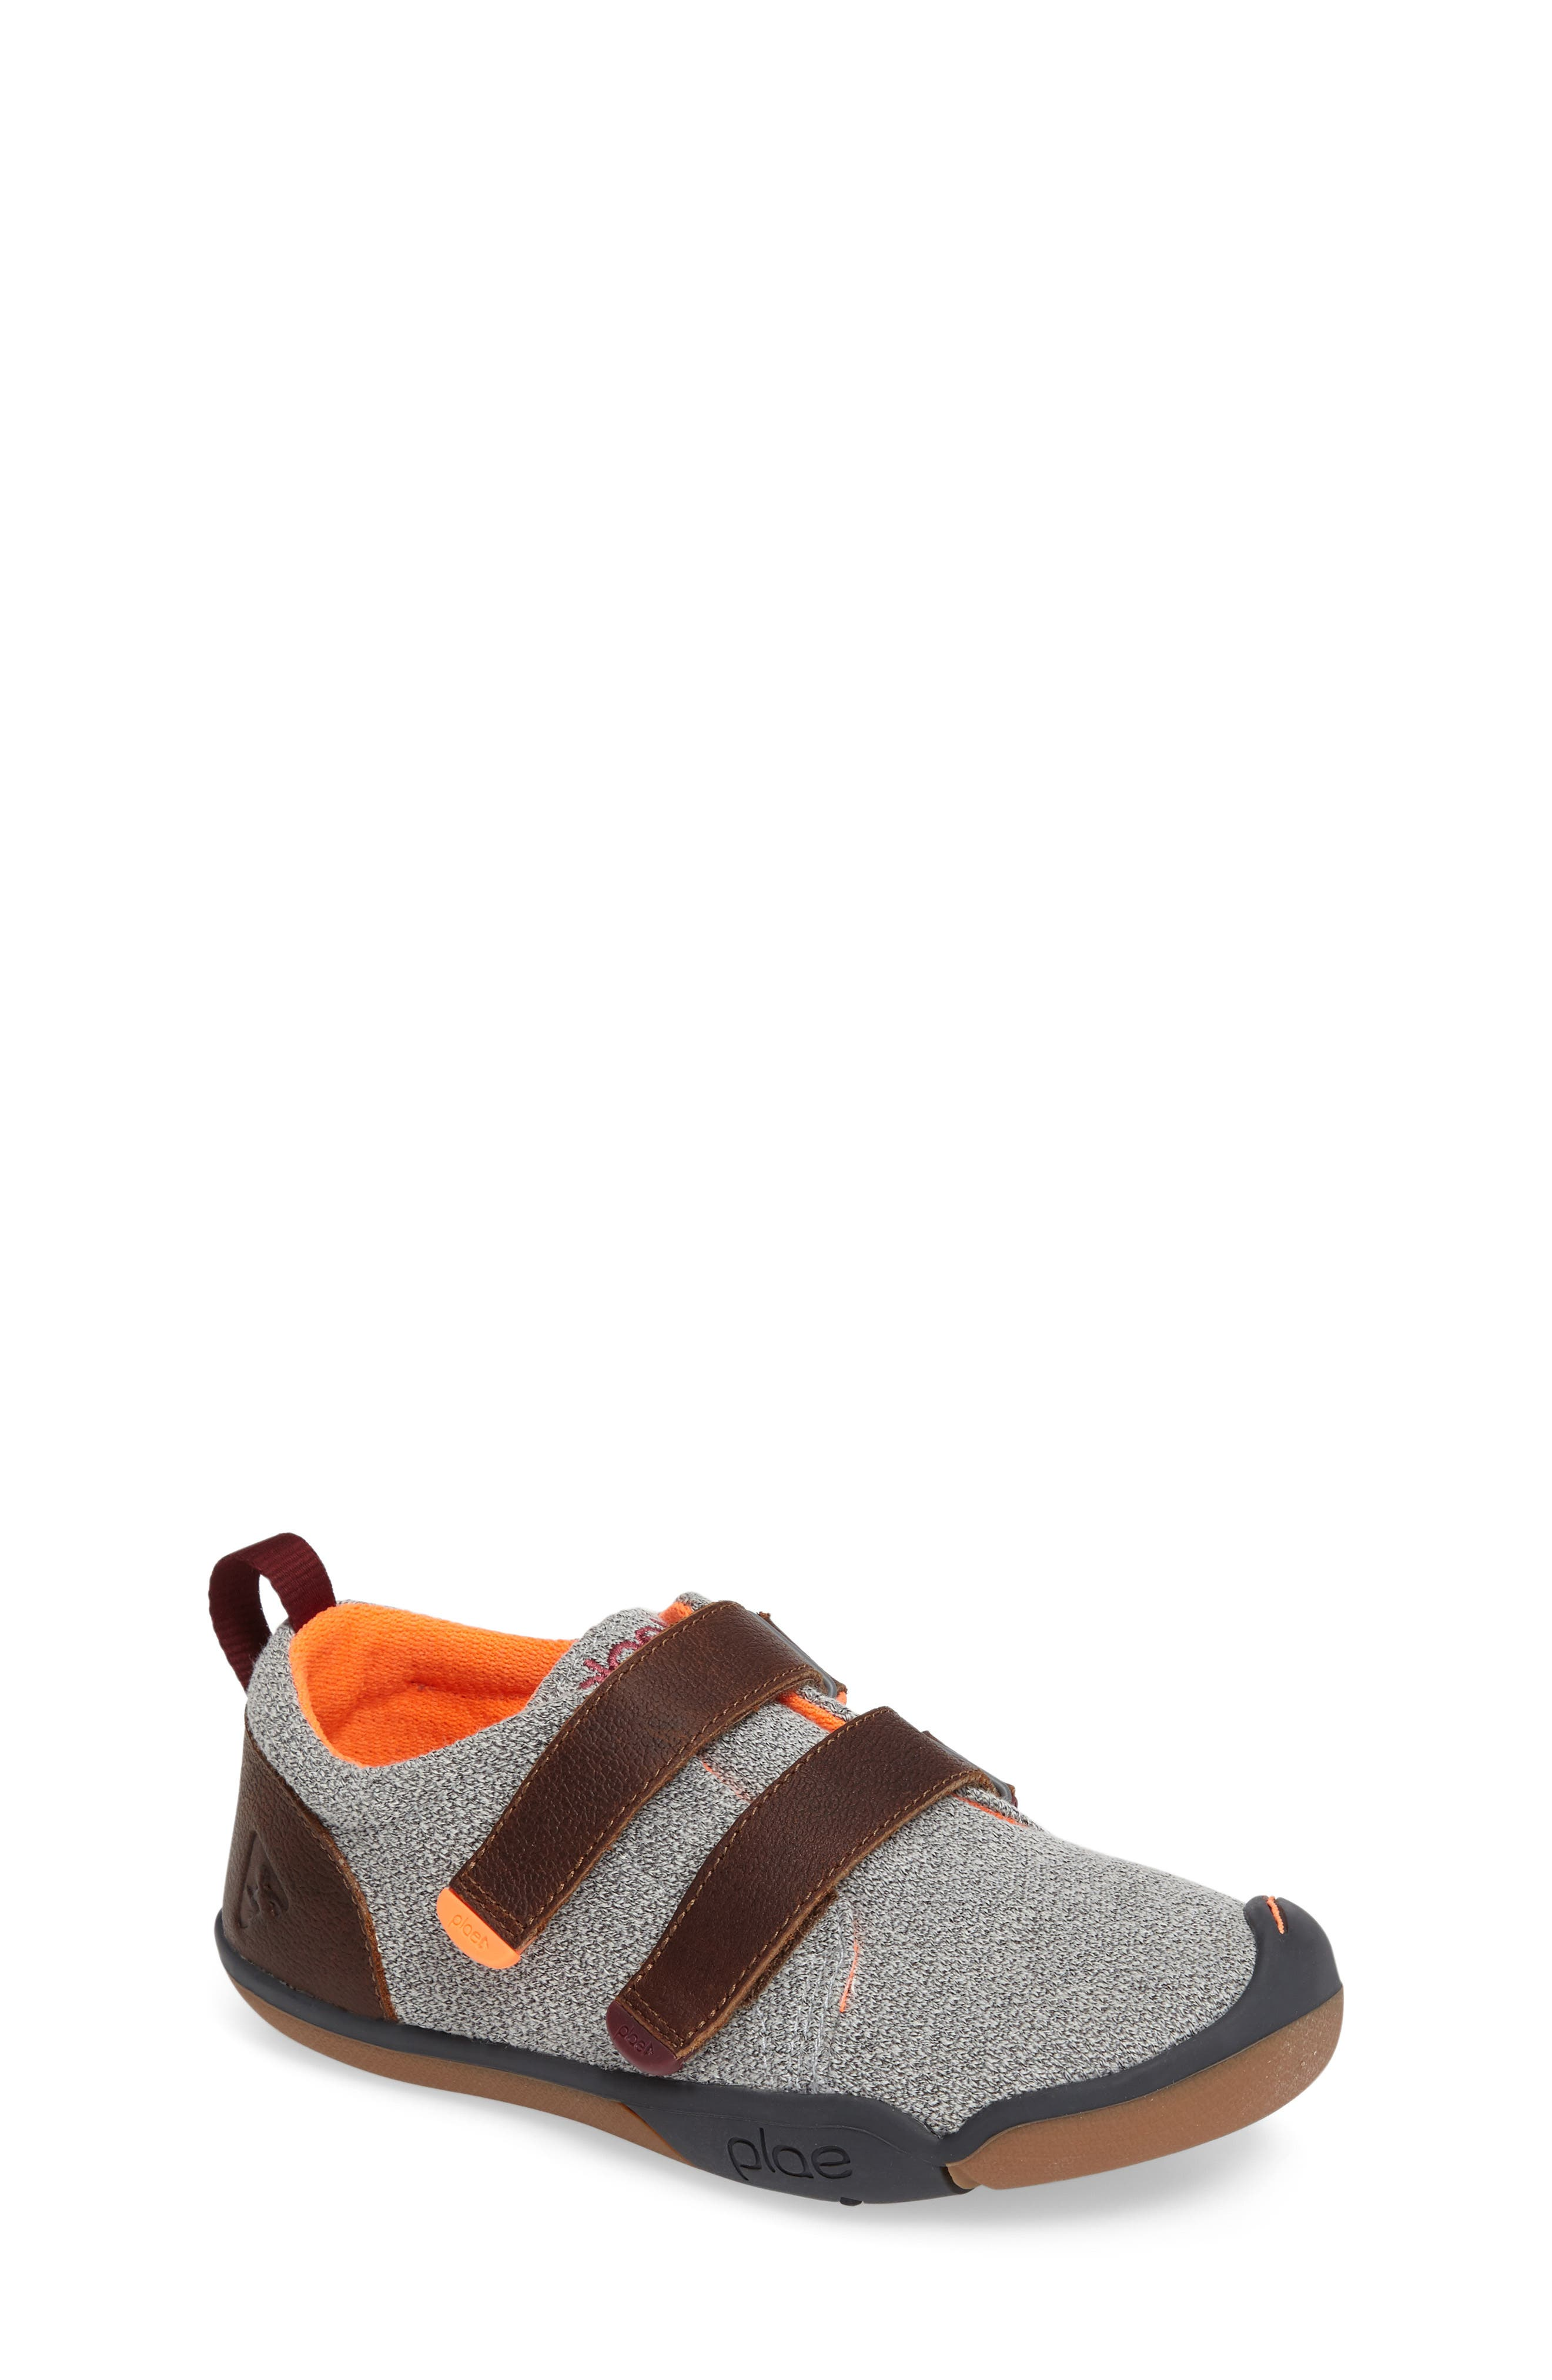 PLAE Roan Customizable Sneaker (Toddler, Little Kid & Big Kid)